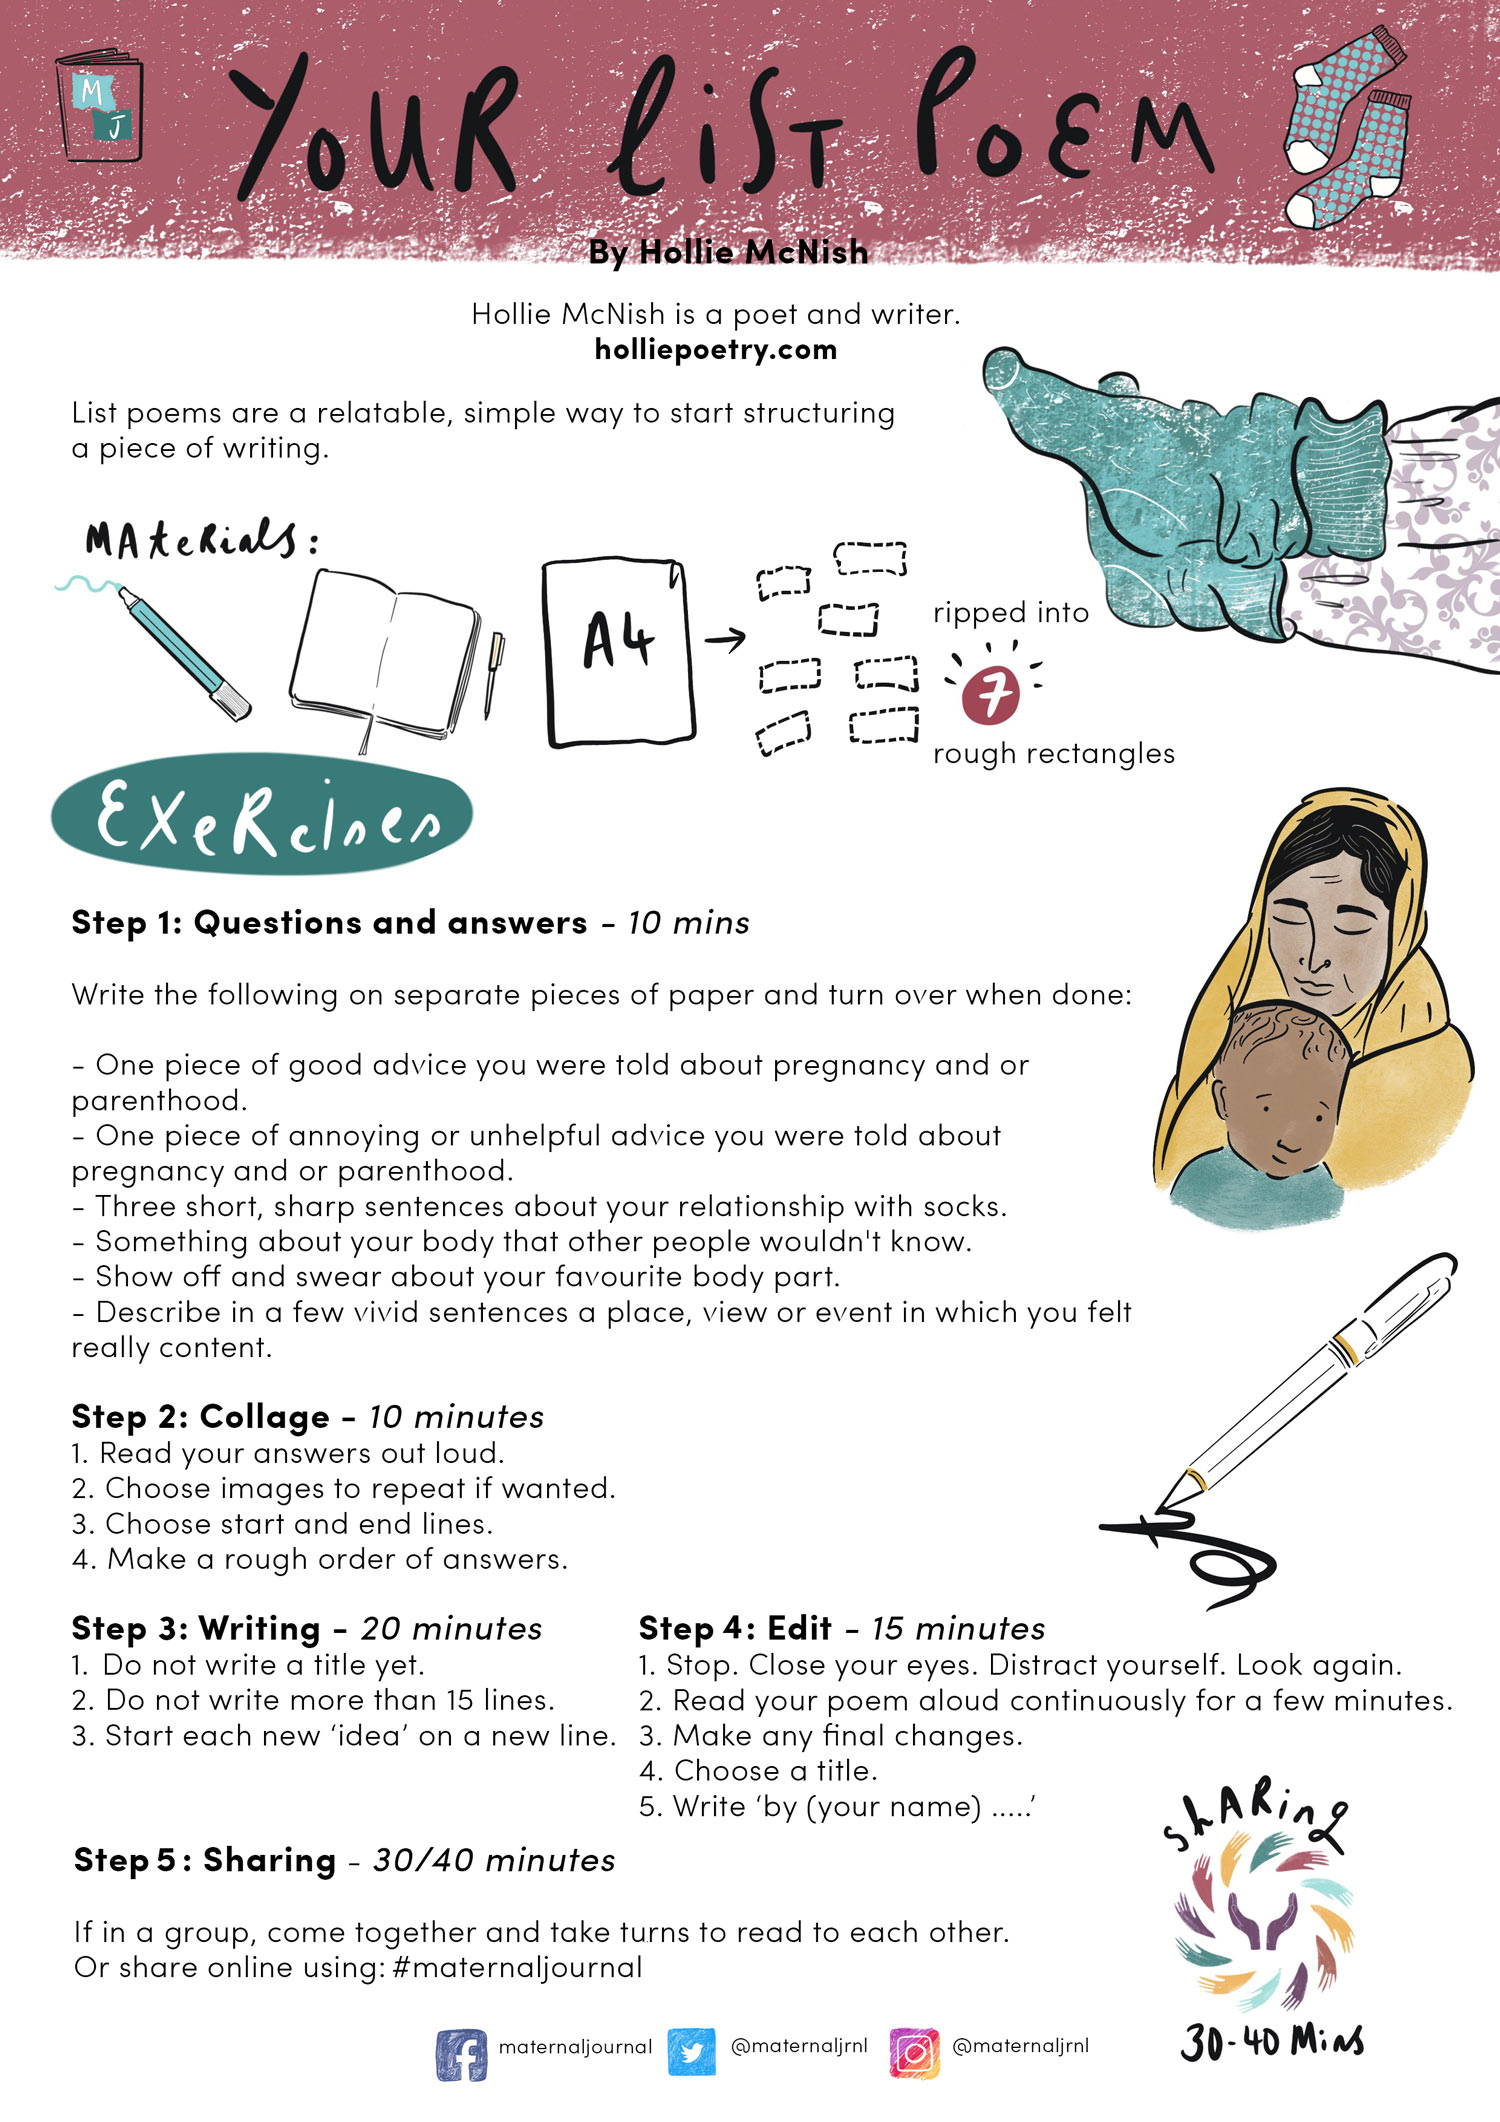 Creative journaling guide by Hollie McNish | Illustration by Merlin Strangeway | Maternal Journal 2019